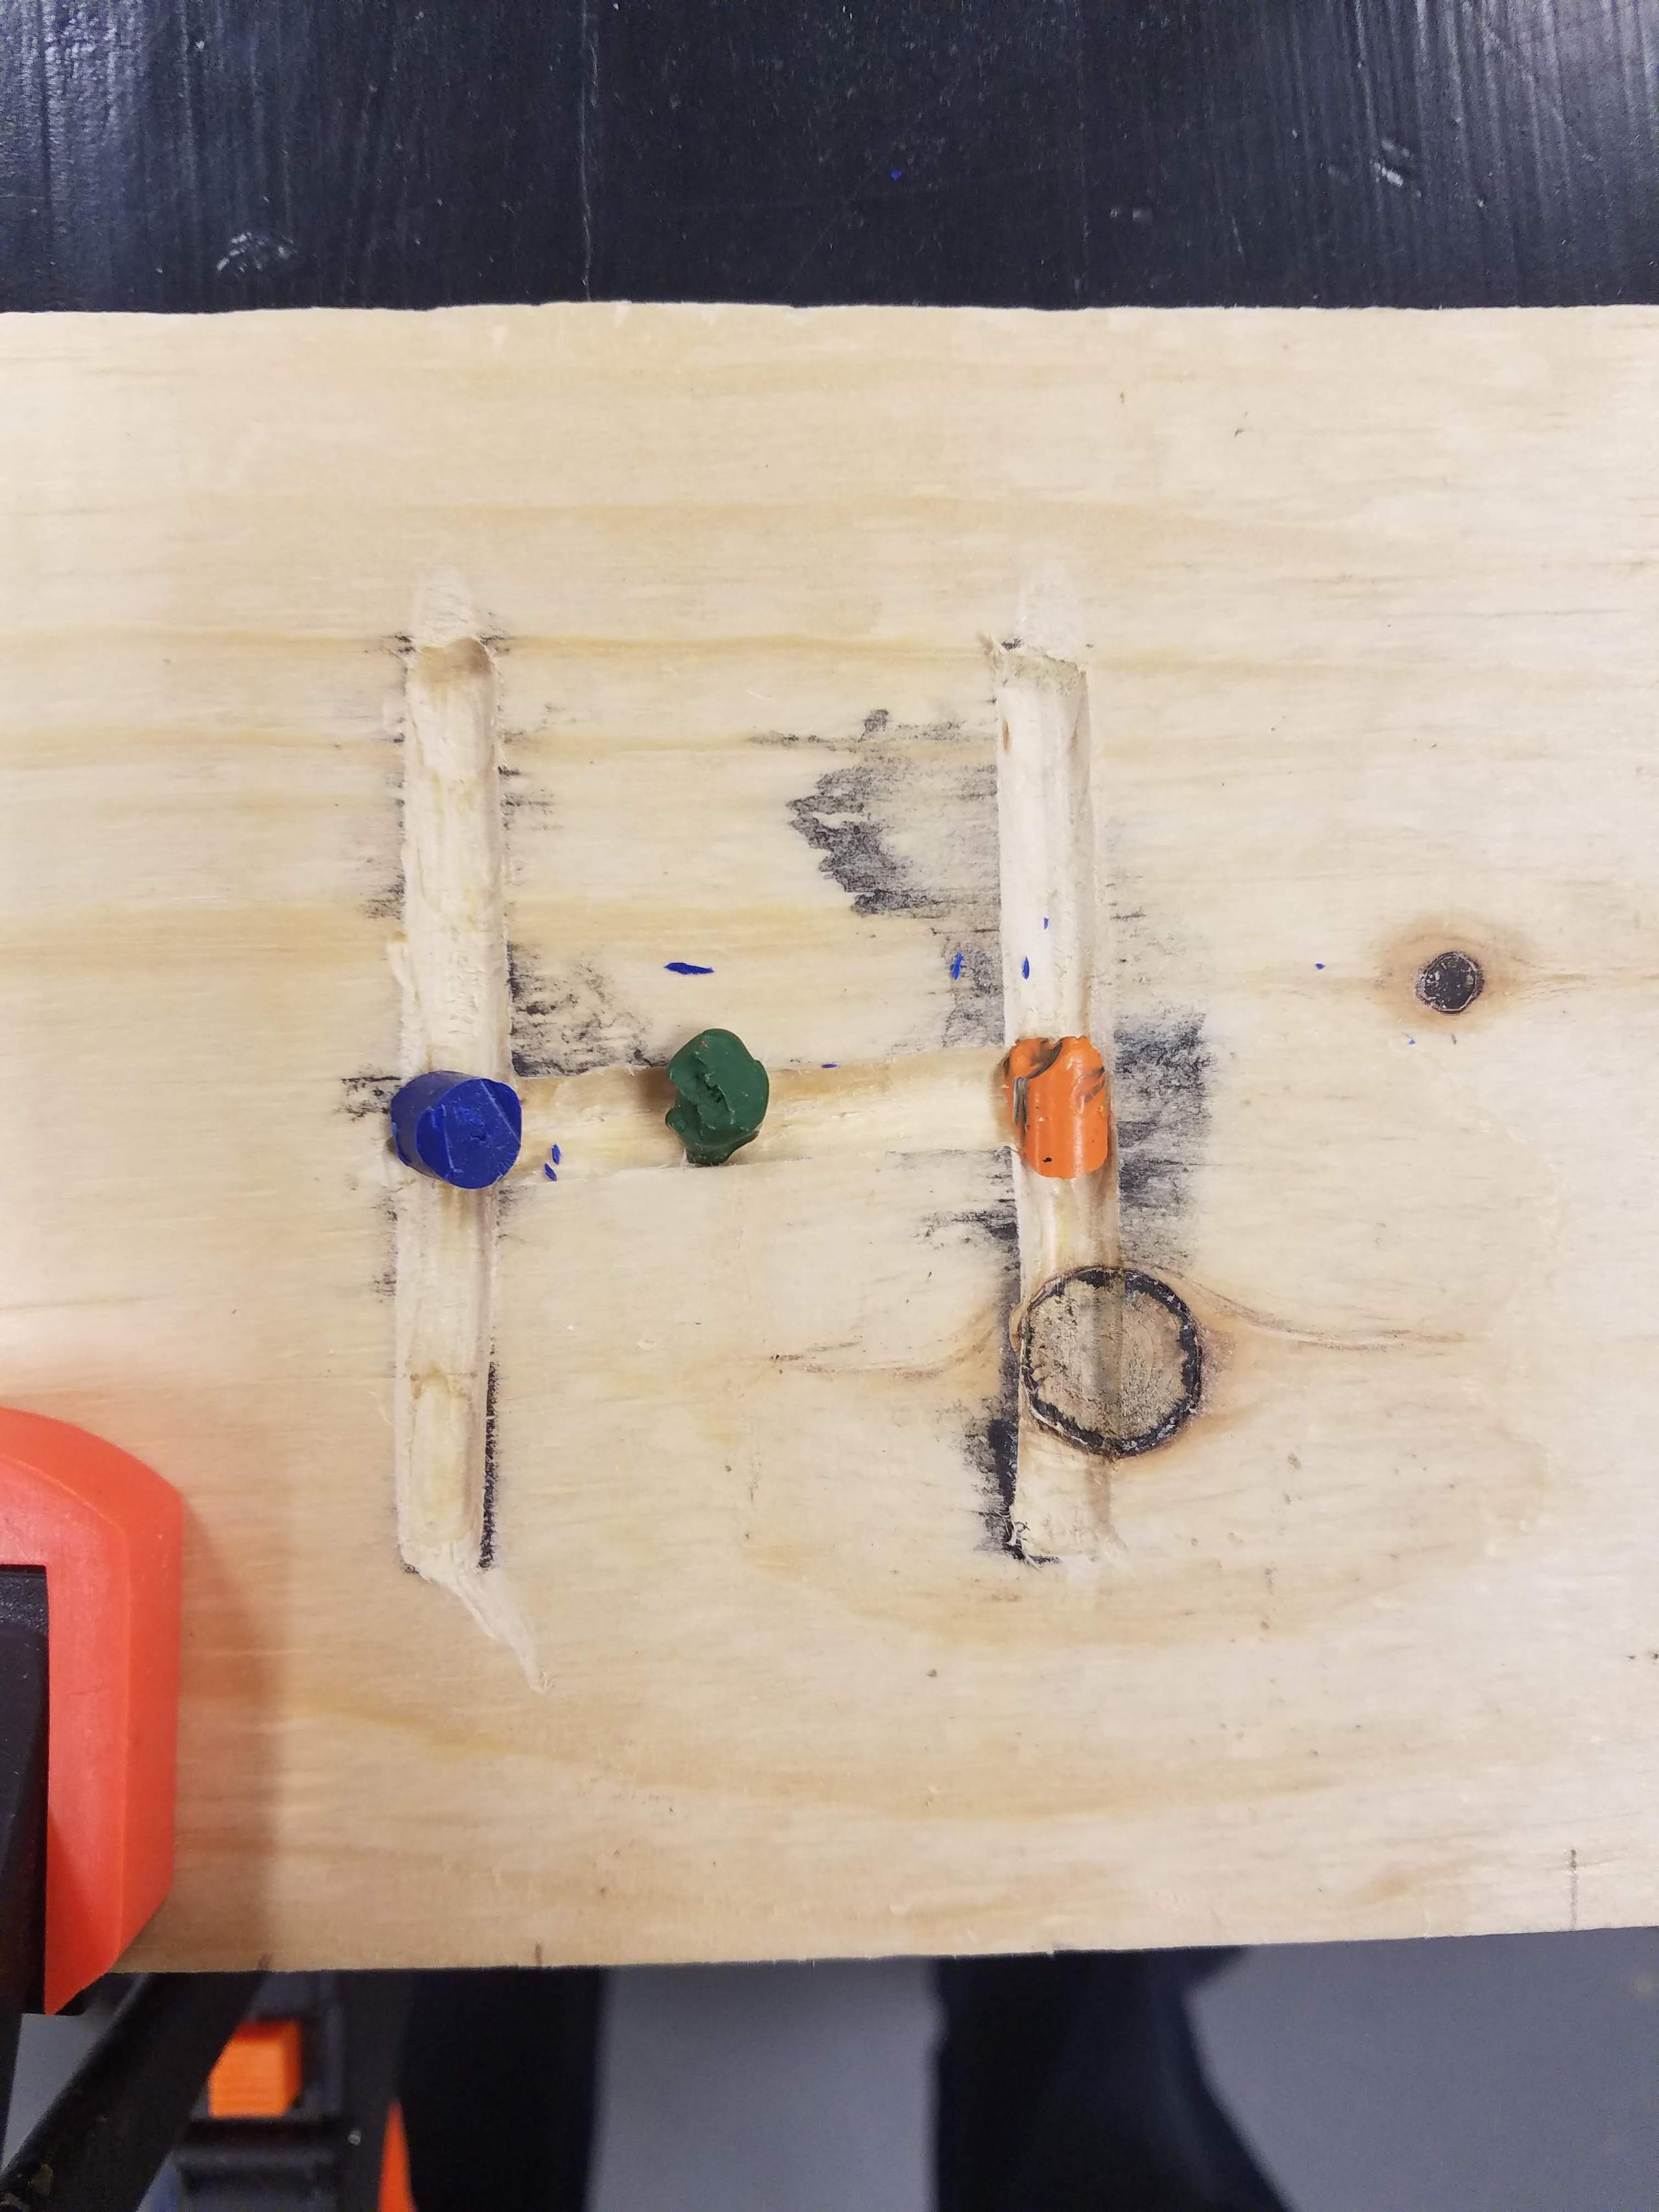 inlay, crayon,  epoxy, resin, wooden,  step stool, pine, Dremel router, crayola